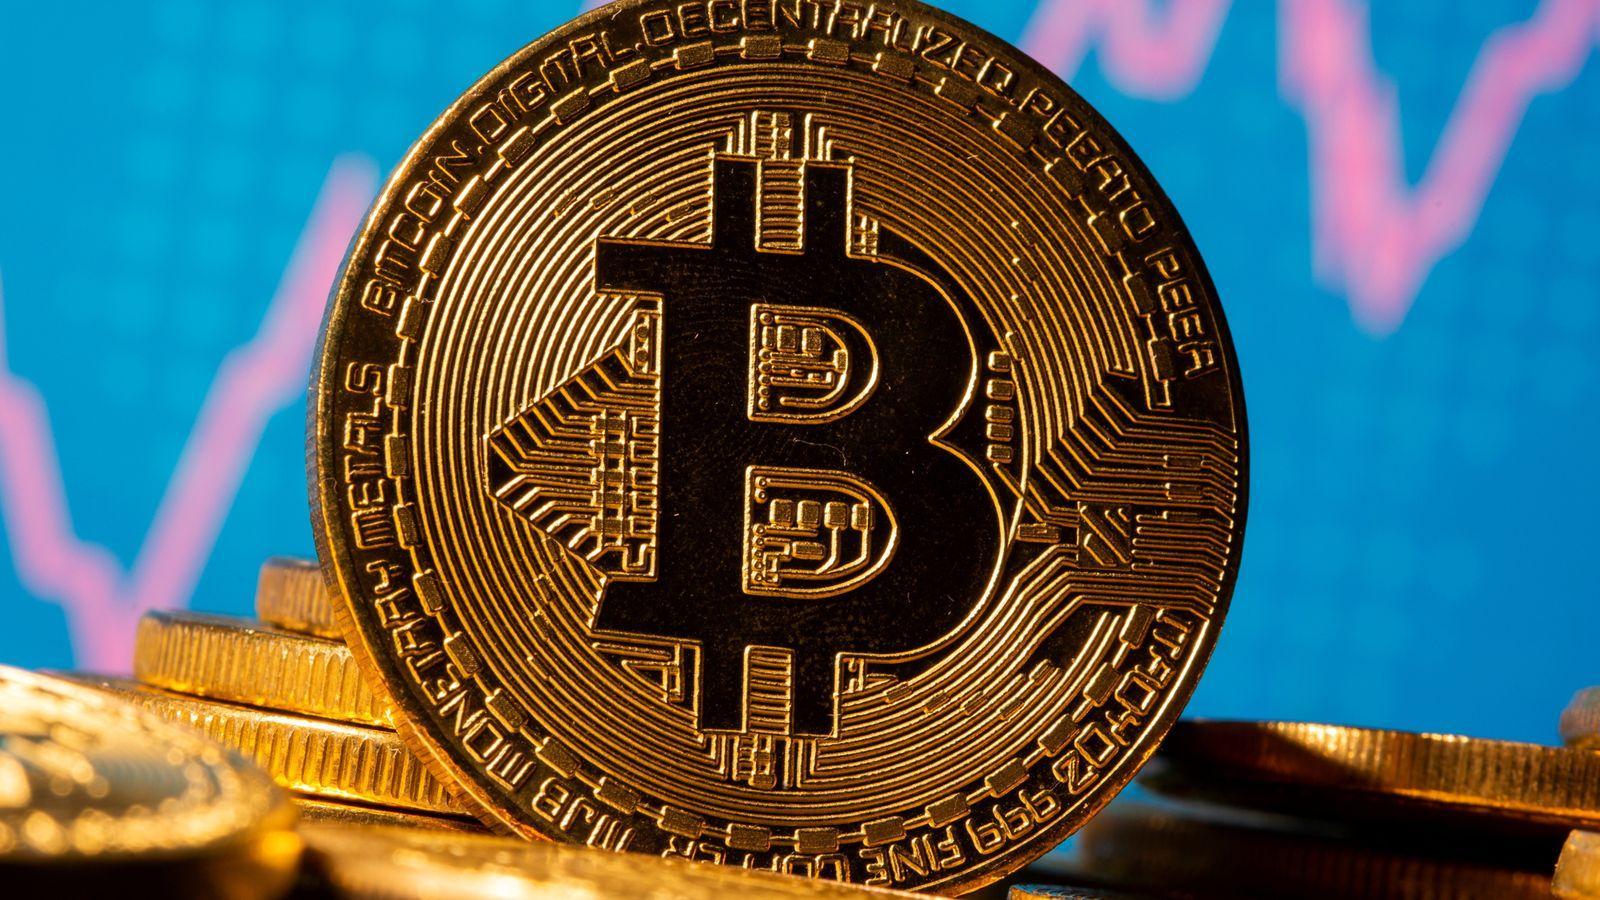 Bitcoin: Βουτιά στην τιμή του κρυπτονομίσματος